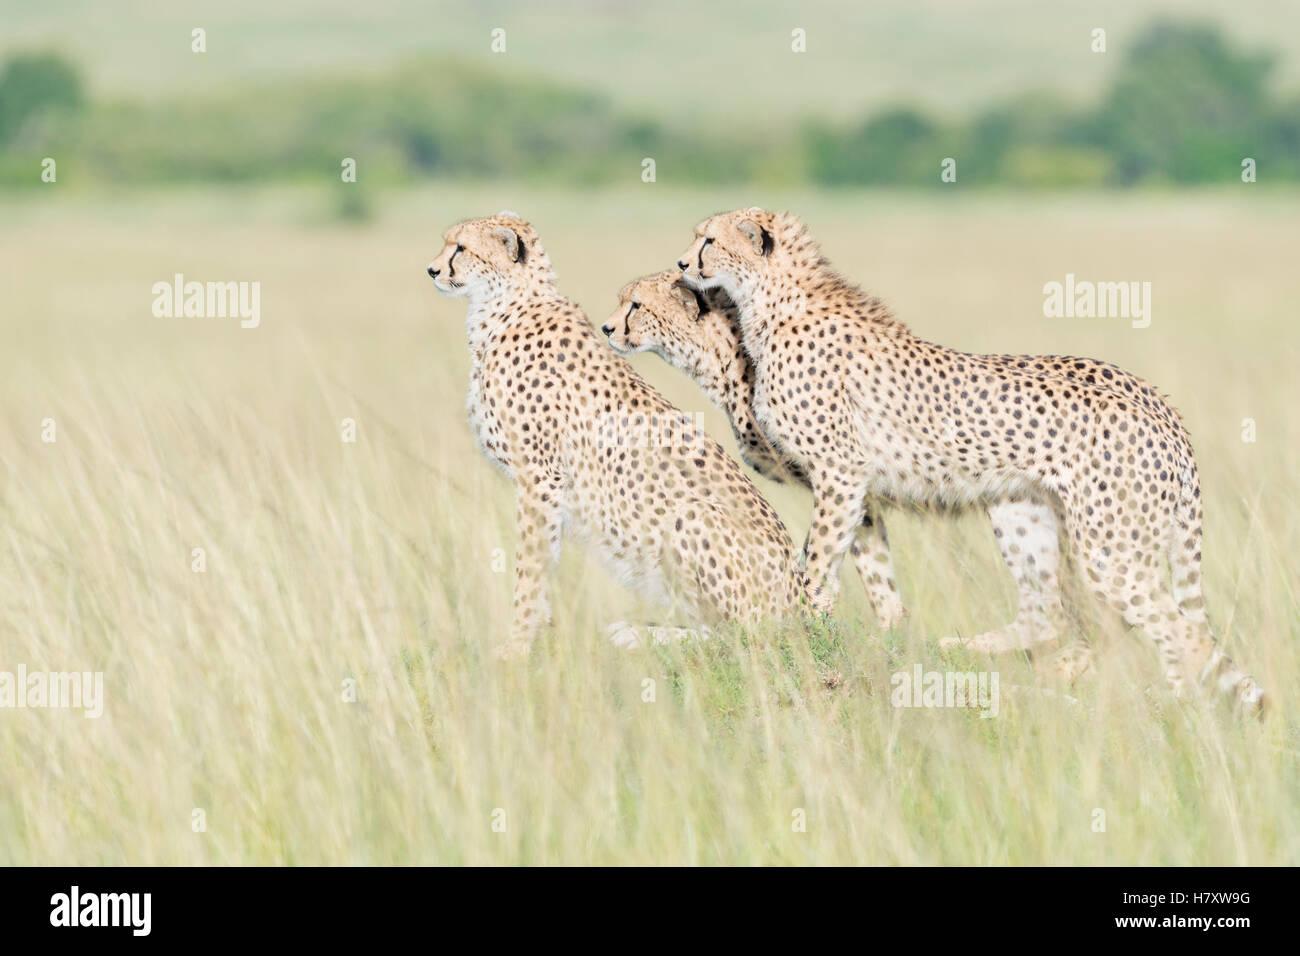 Trois Cheetah (Acinonix jubatus) Comité permanent sur l'affût à Savanna, Maasai Mara National Photo Stock